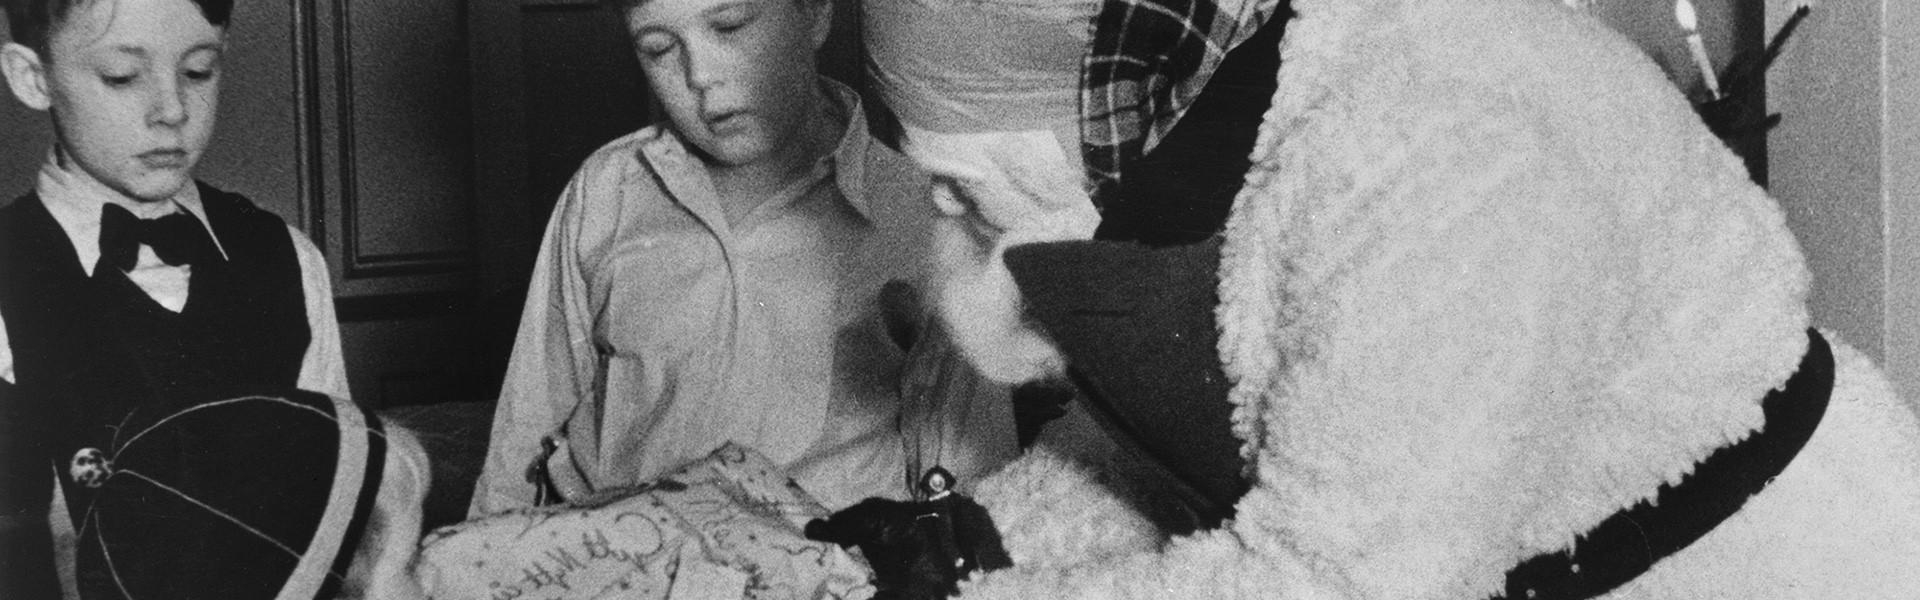 Julklappsutdelande tomte 1936. Foto: Gunnar Lundh ©Nordiska museet